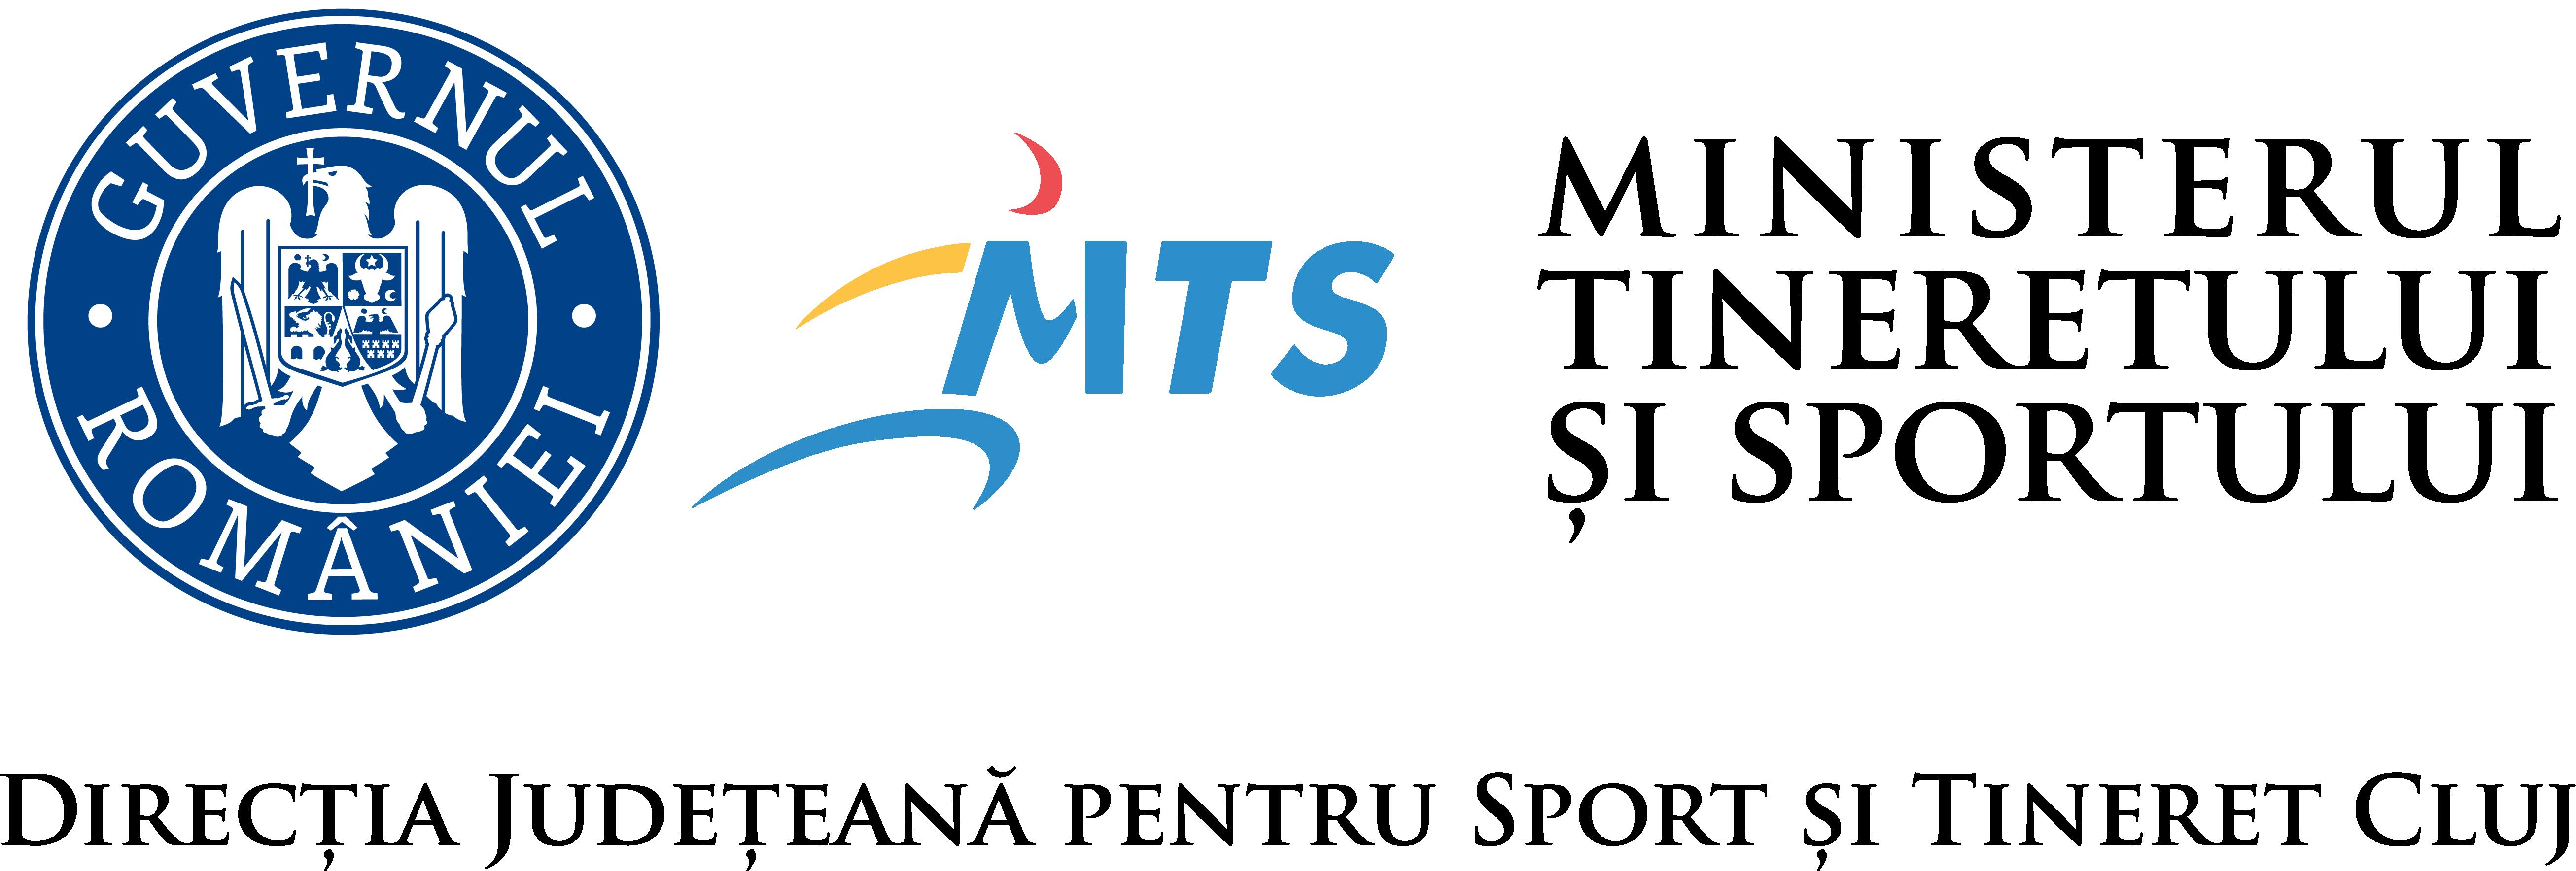 Directia Judeteana pentru Sport si Tineret Cluj